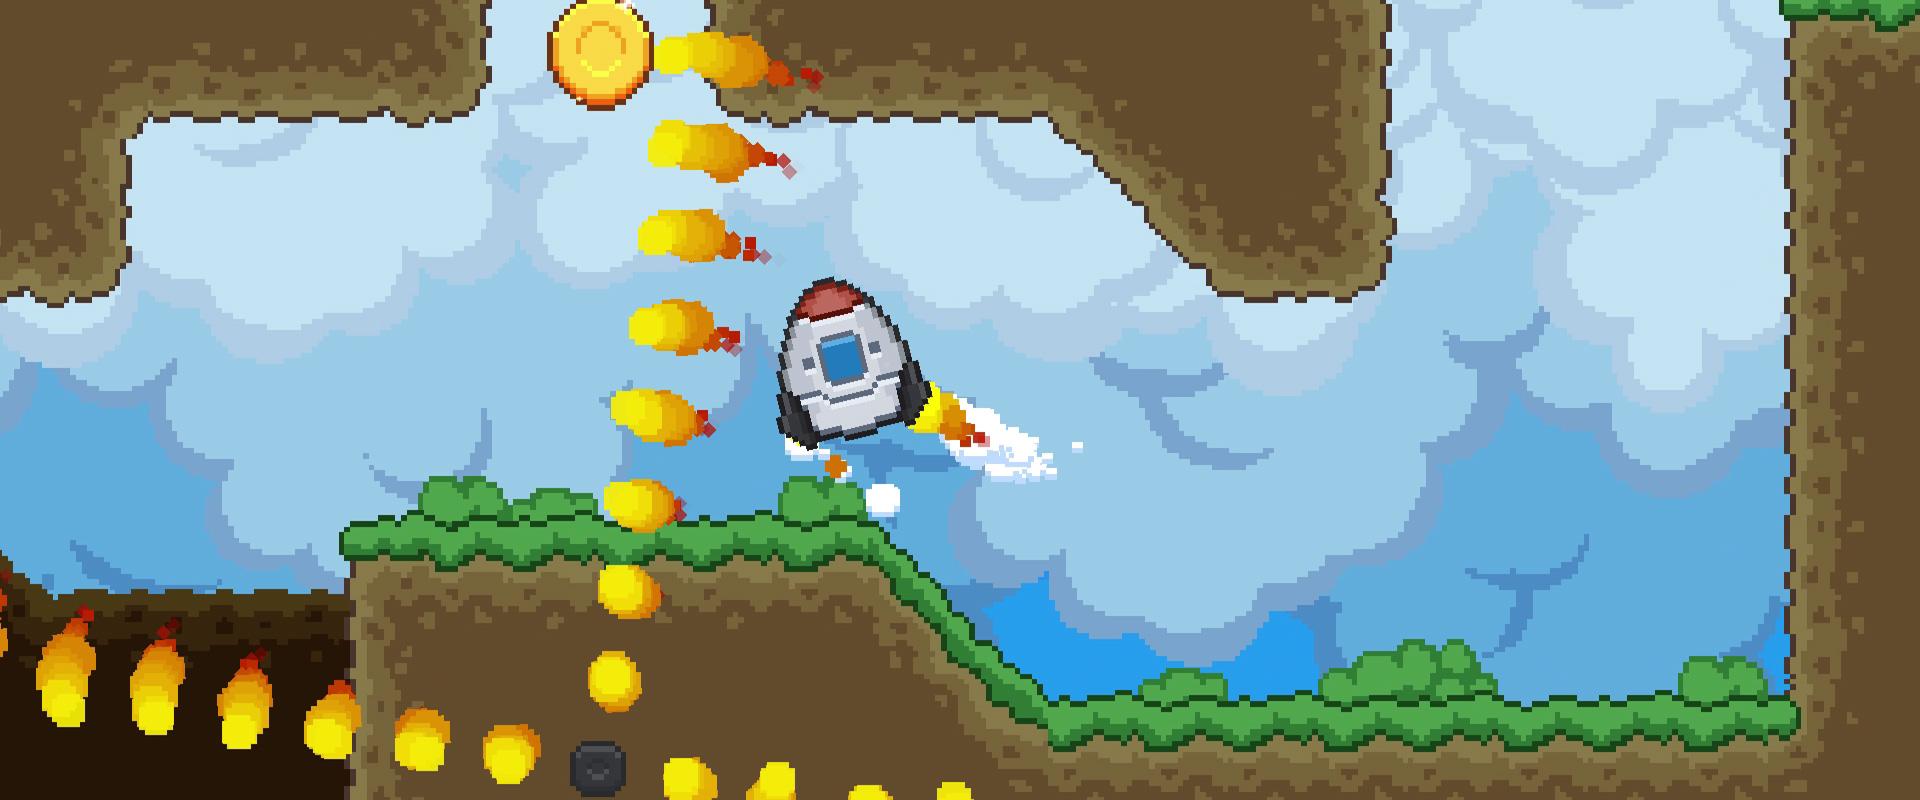 Super Rocket Ride